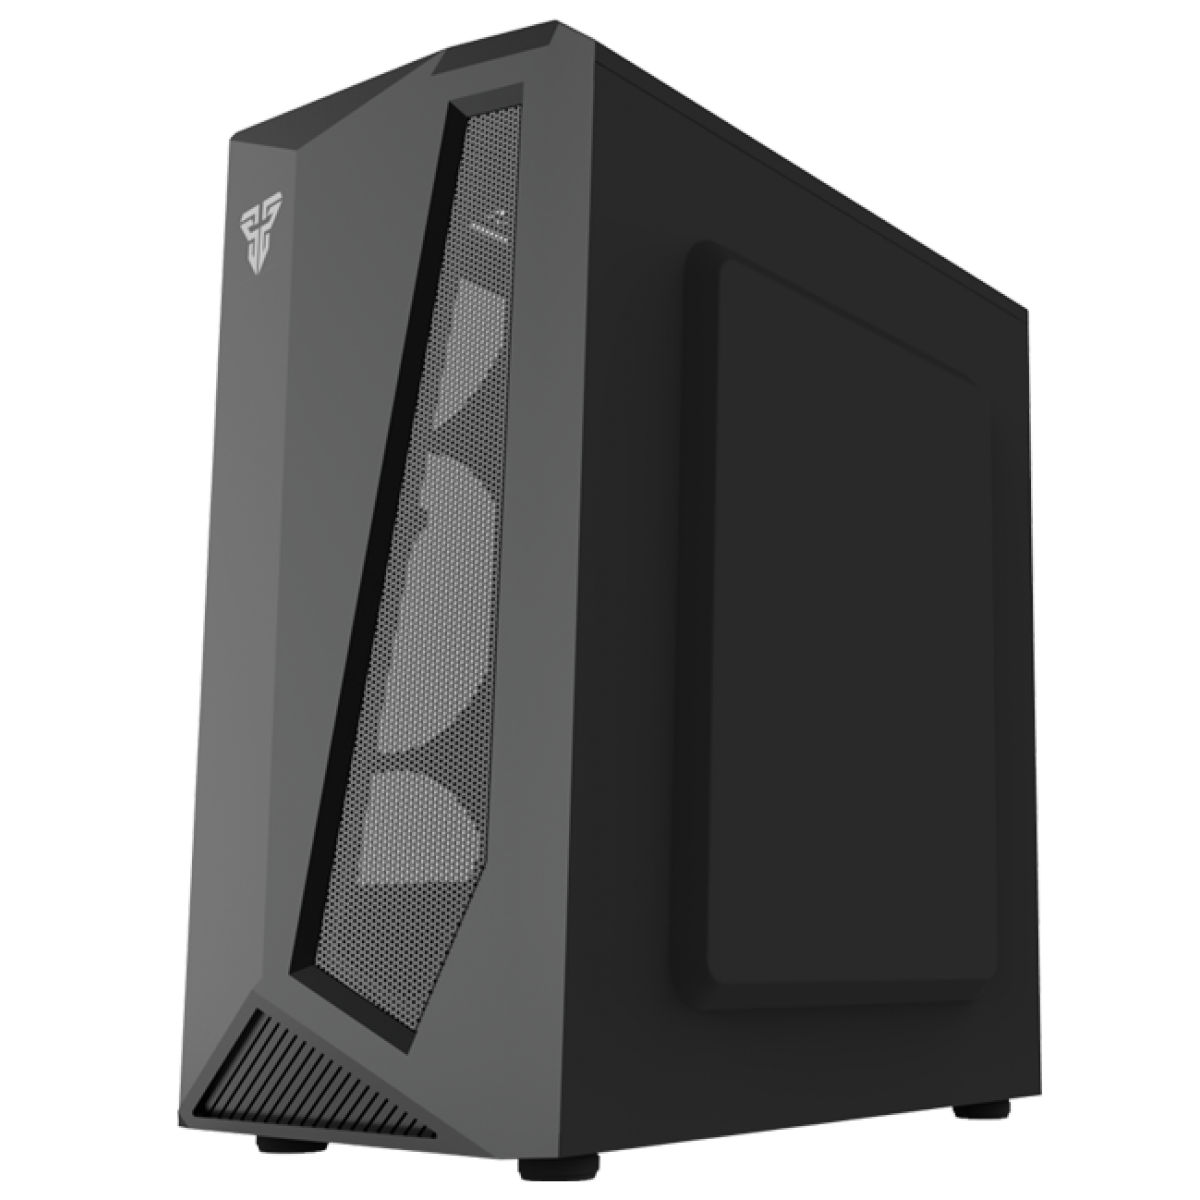 Gabinete Gamer Fantech Pulse, Mid Tower, Vidro Temperado, Black, RGB, ATX, Sem Fonte, Sem Fan, CG71